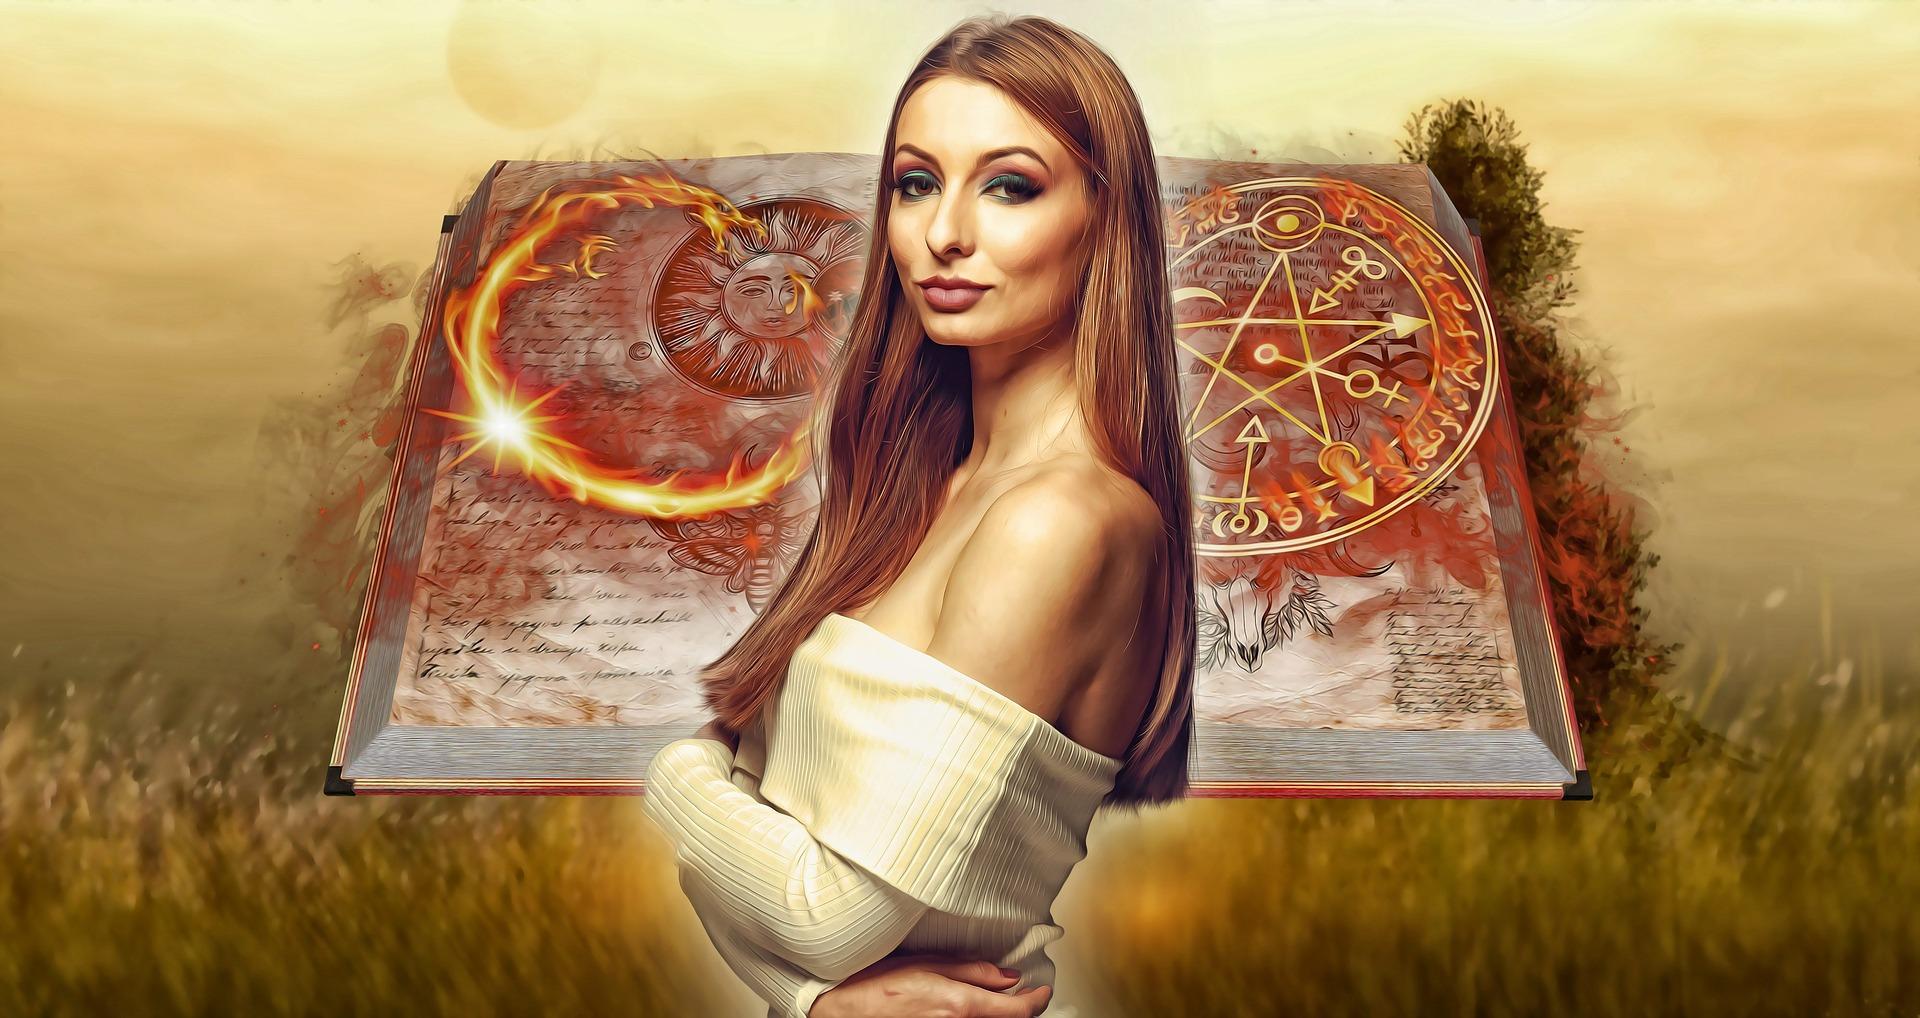 horoscop fecioara - sfatulparintilor.ro - pixabay_com - magician-1830244_1920